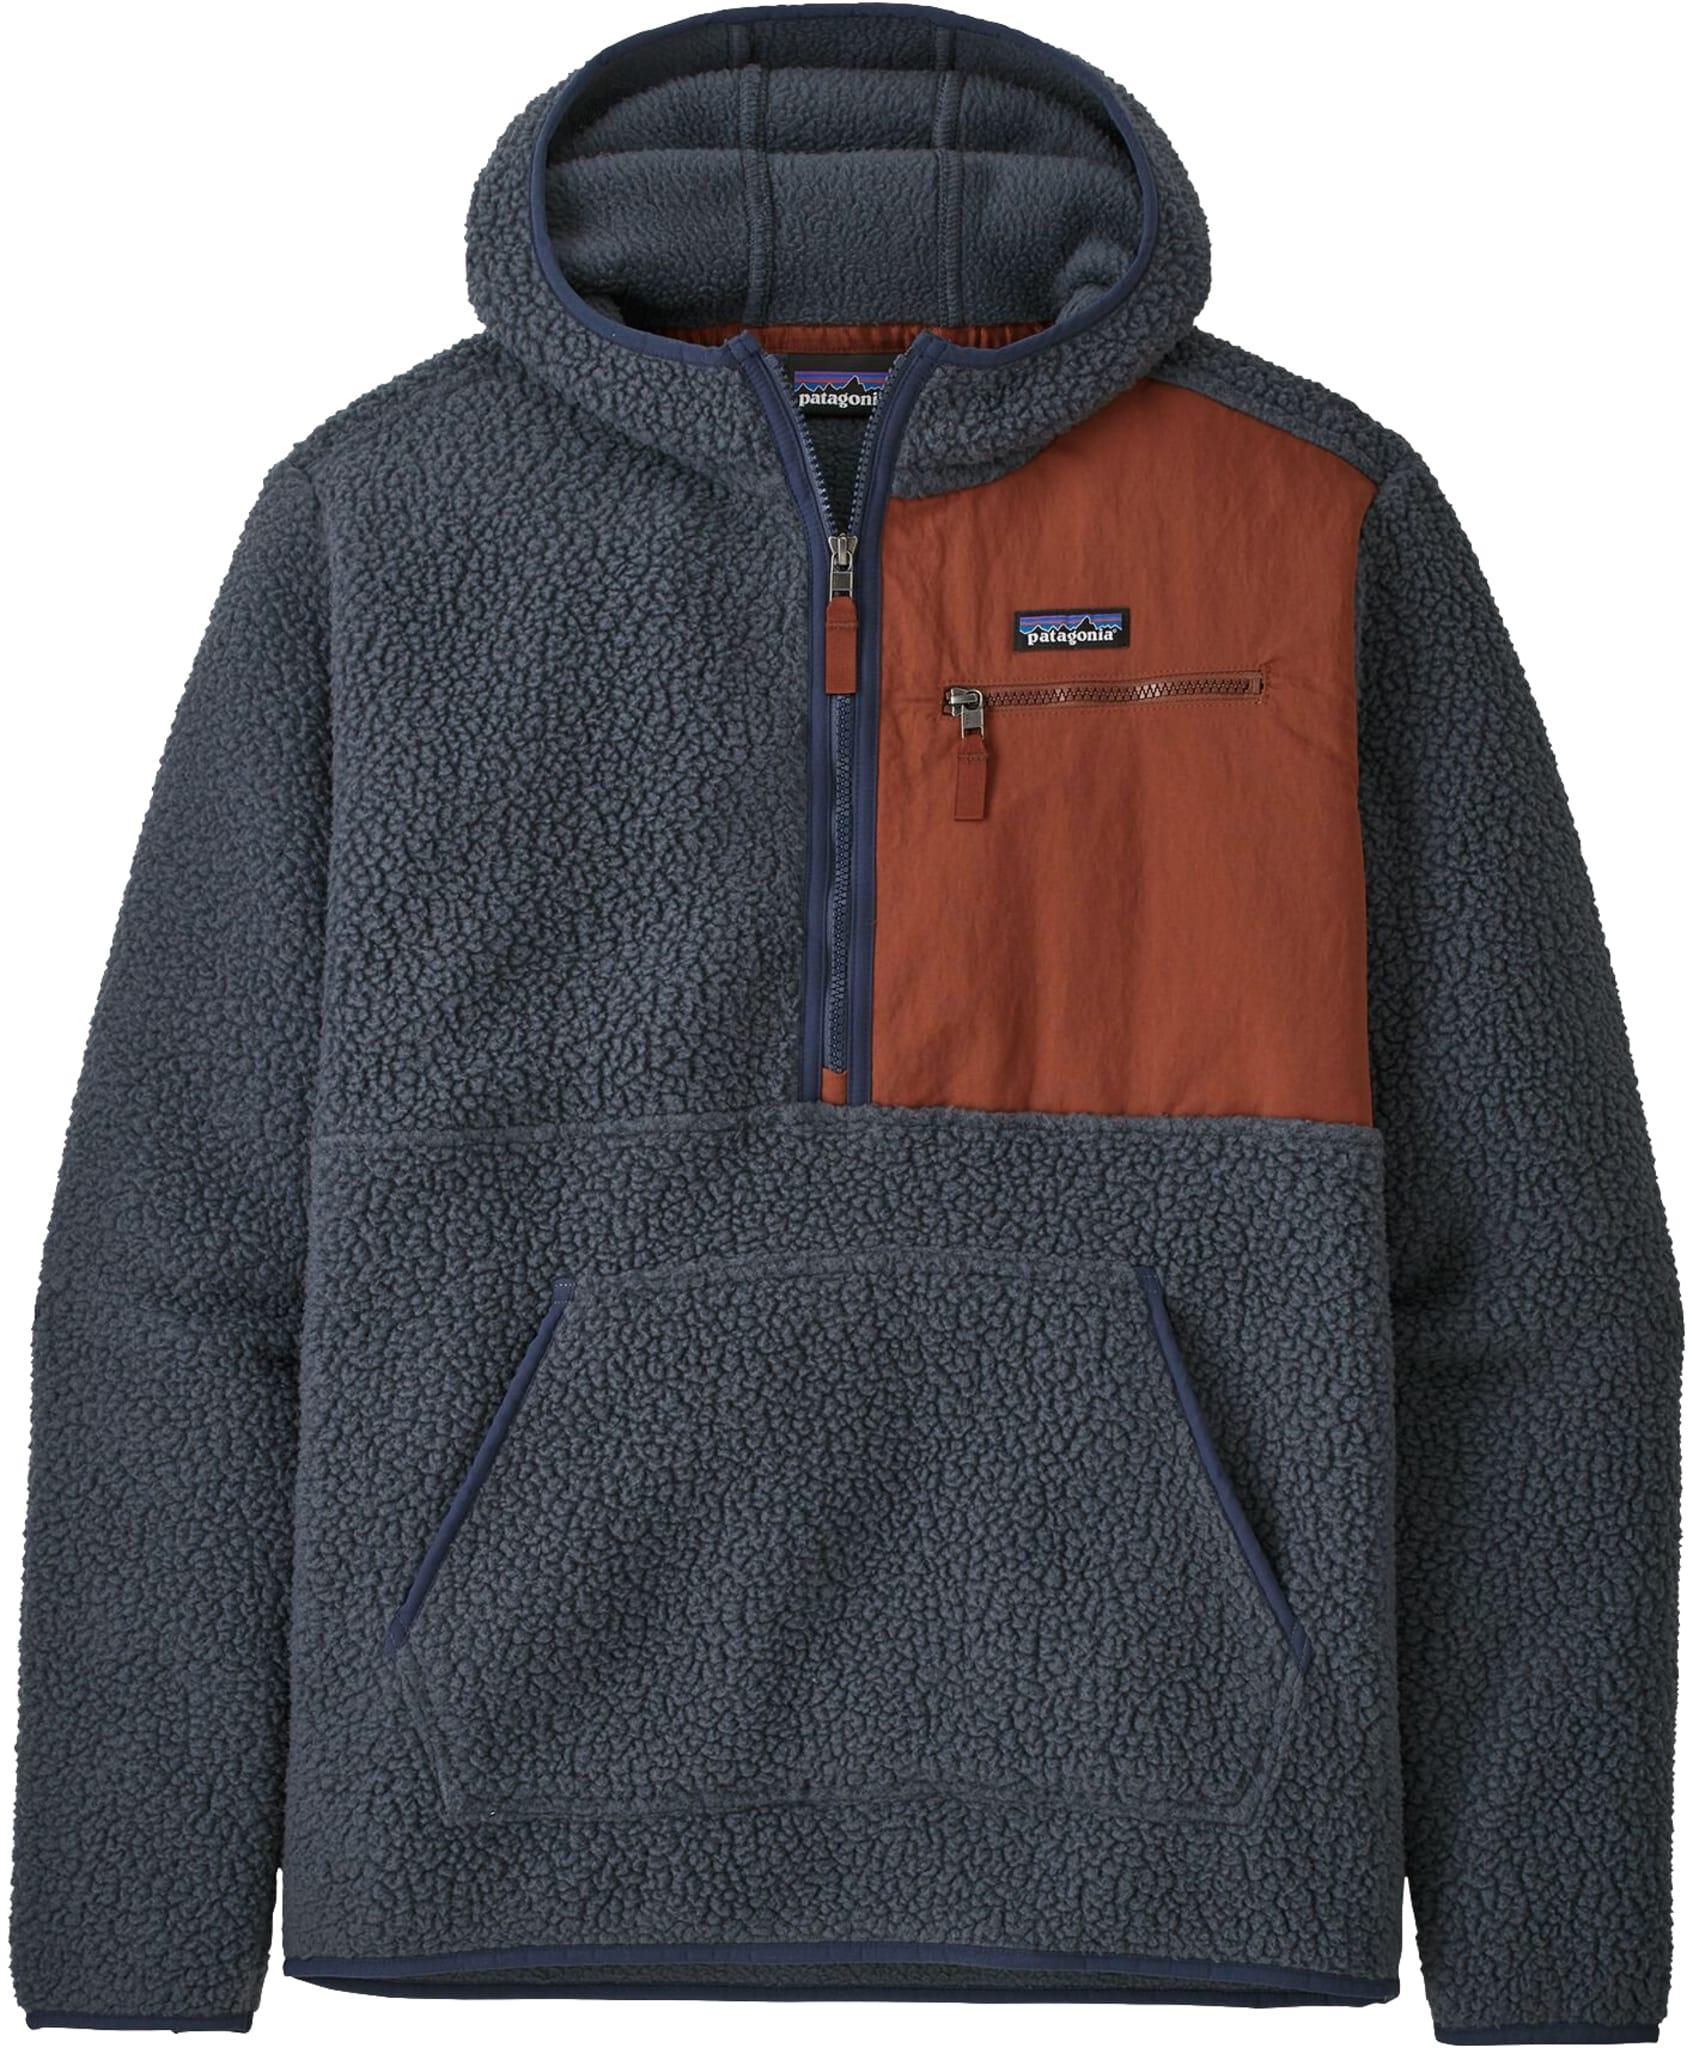 Retro Pile Fleece Pullover M